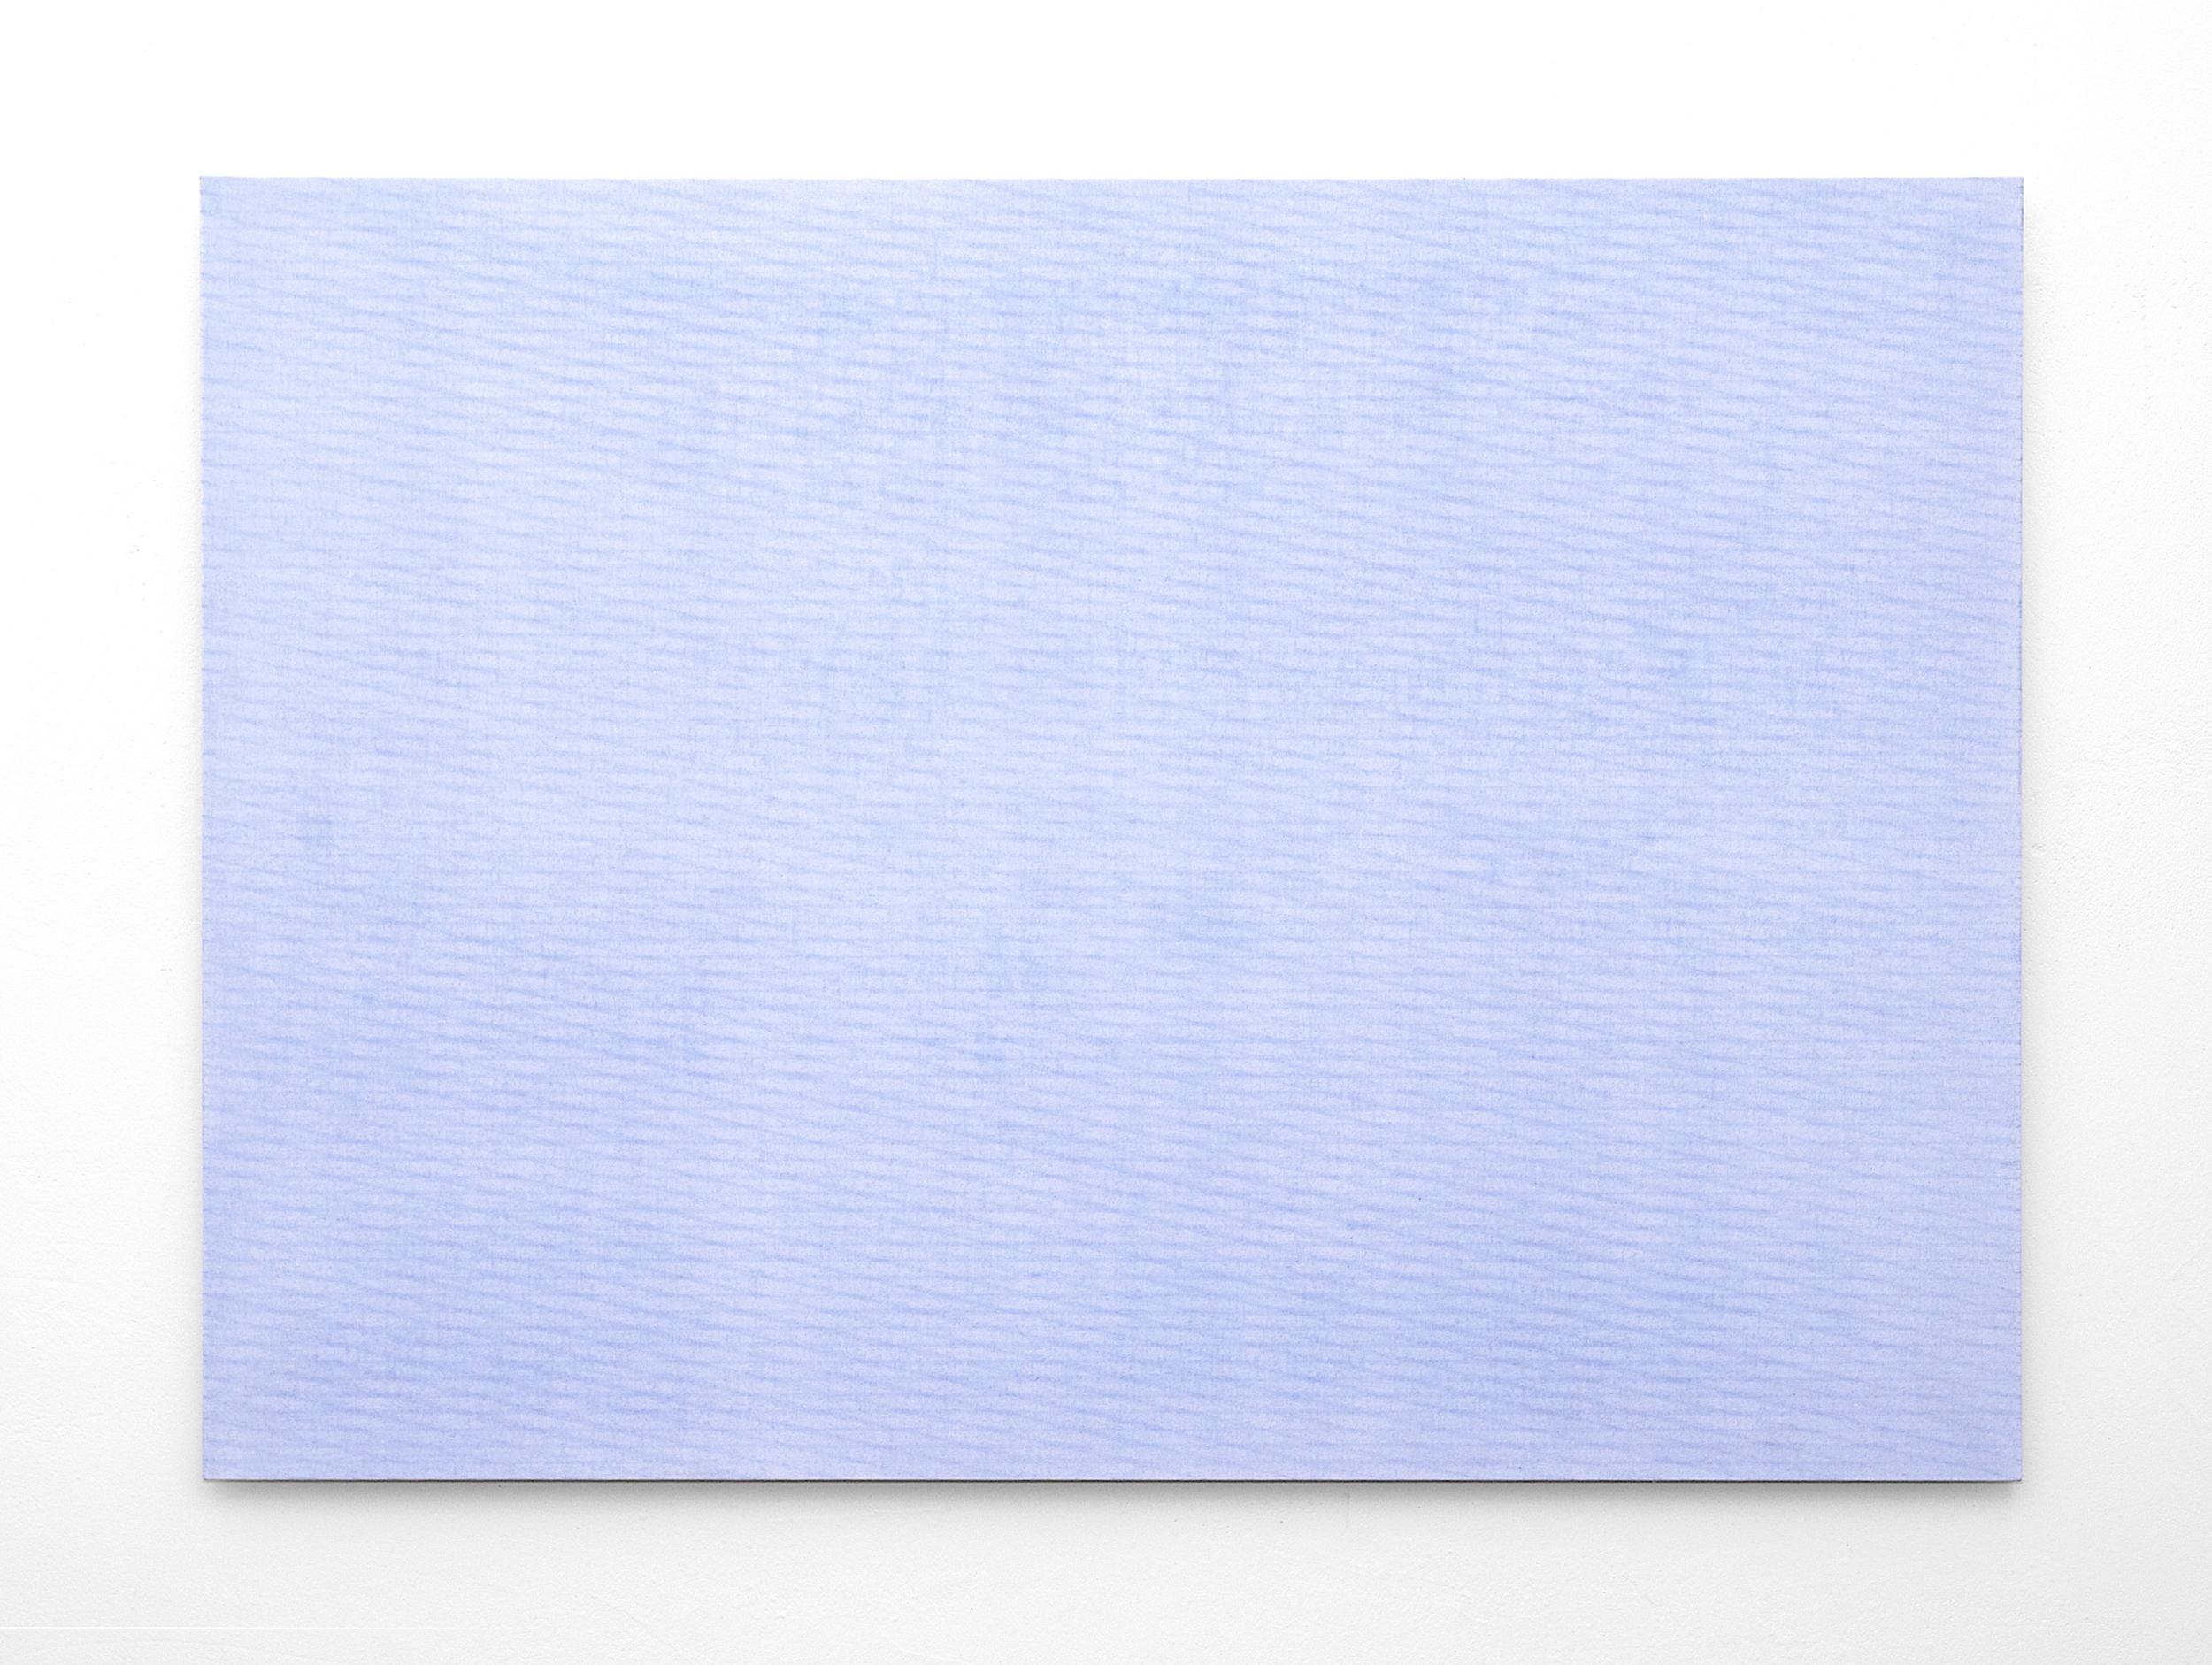 bild nr. 13/2012-100 x 140cm - acryl auf baumwolle/alu